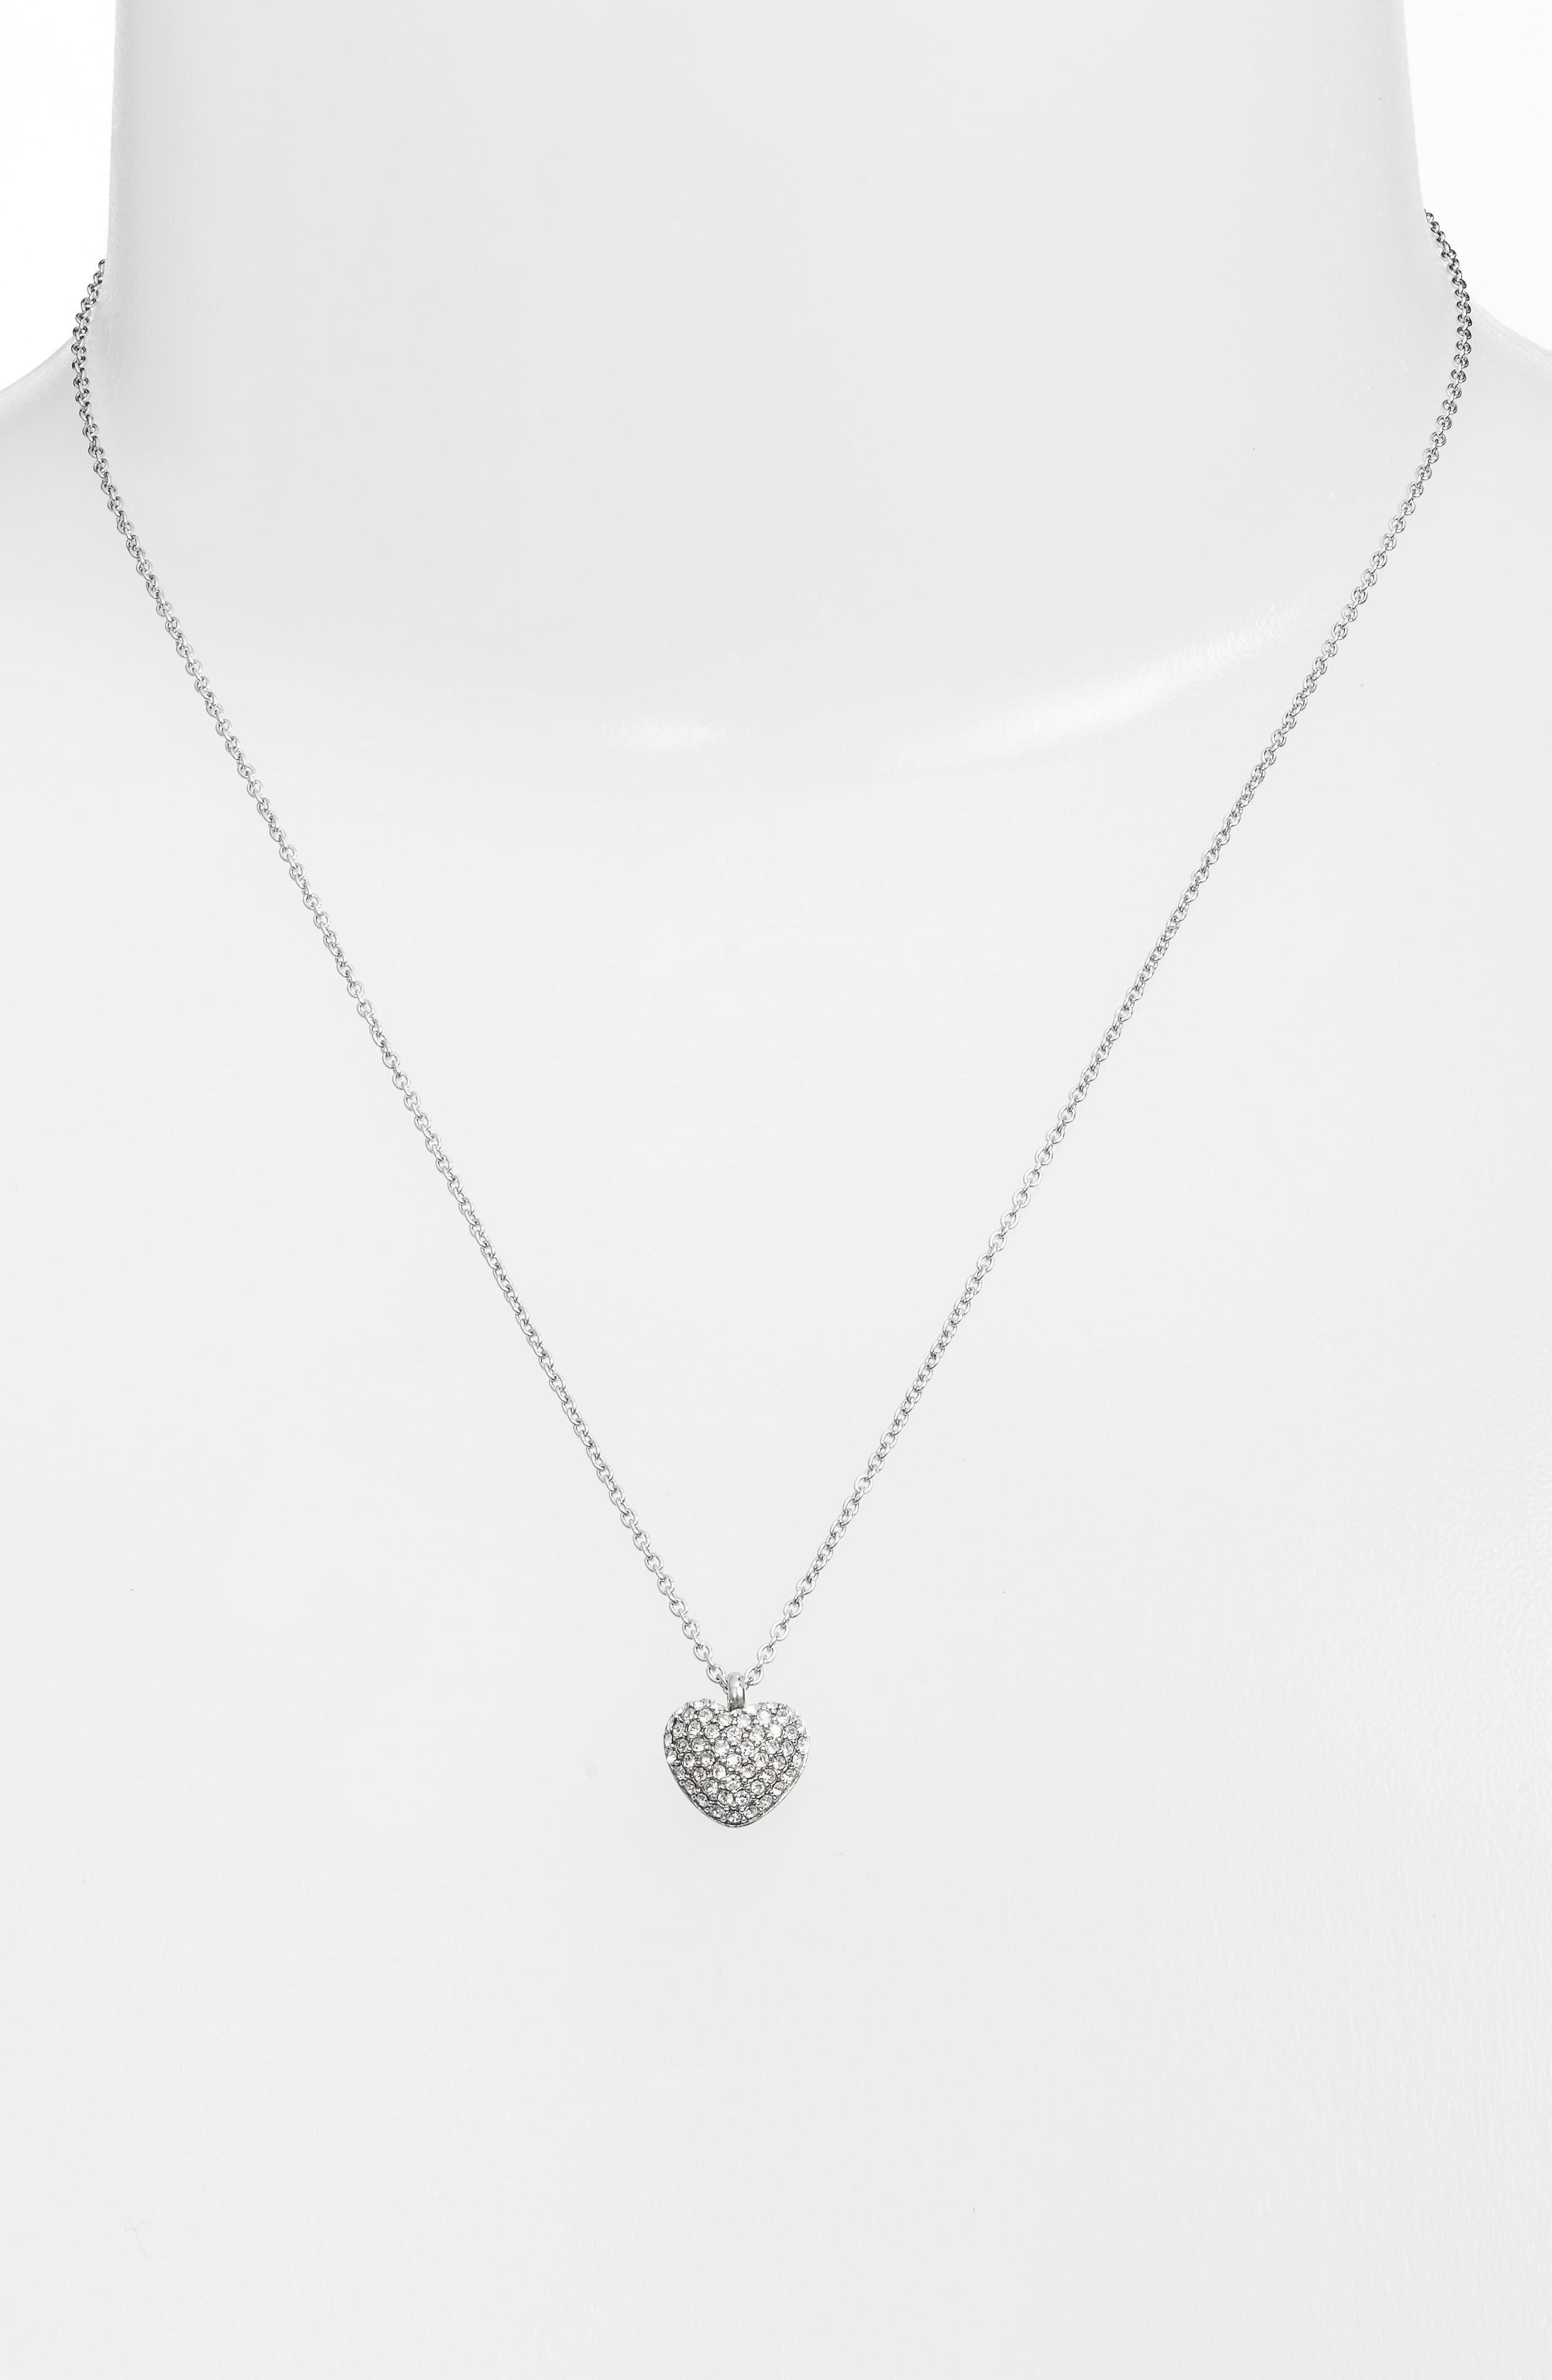 Alternate Image 1 Selected - Michael Kors Pavé Heart Pendant Necklace